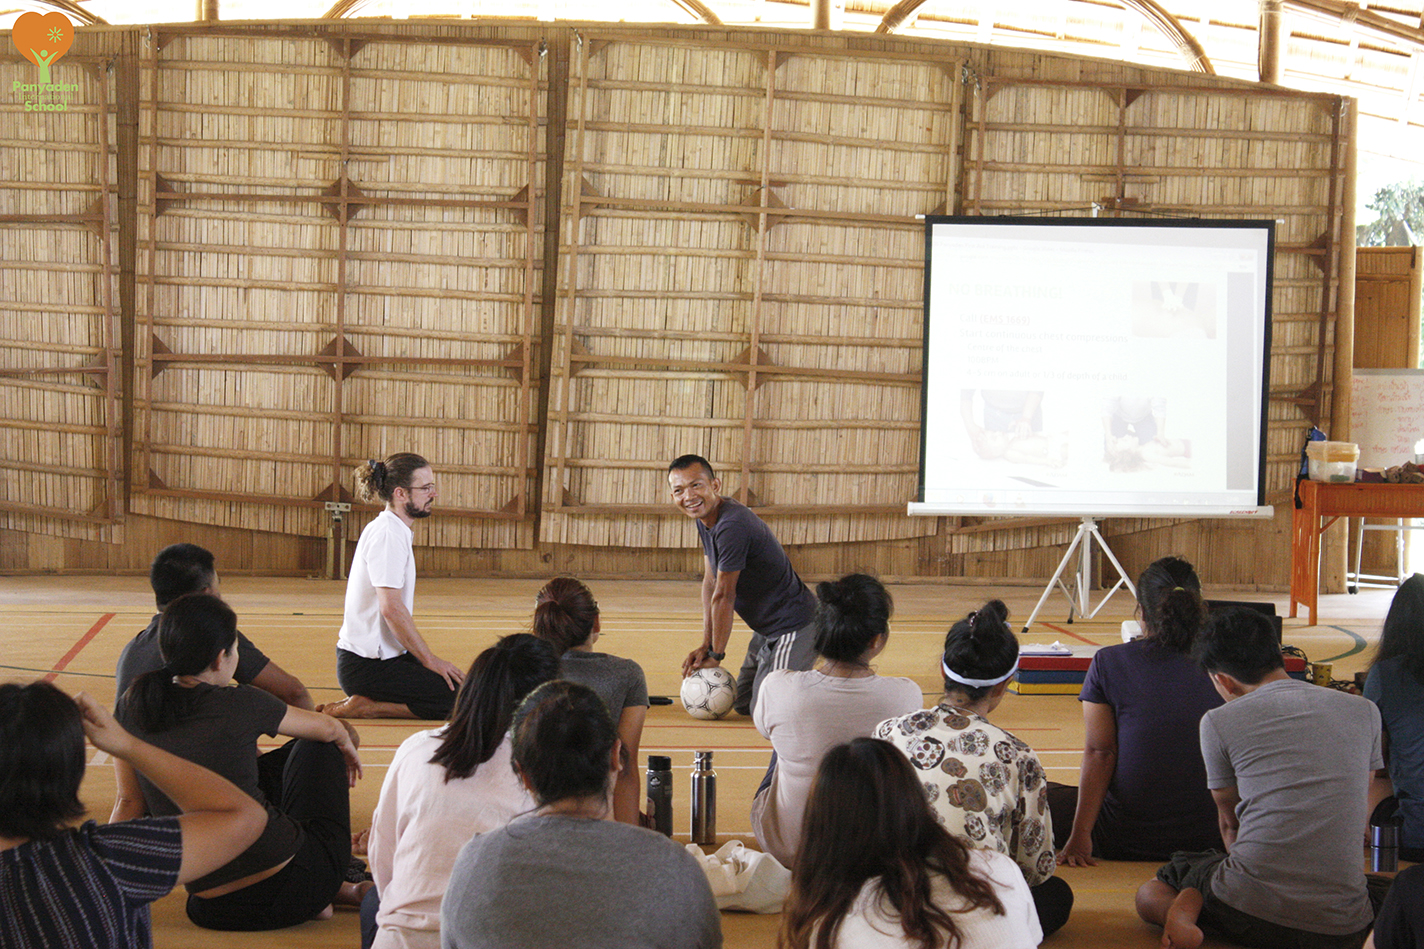 Teacher Training at Panyaden - learning basic first aid